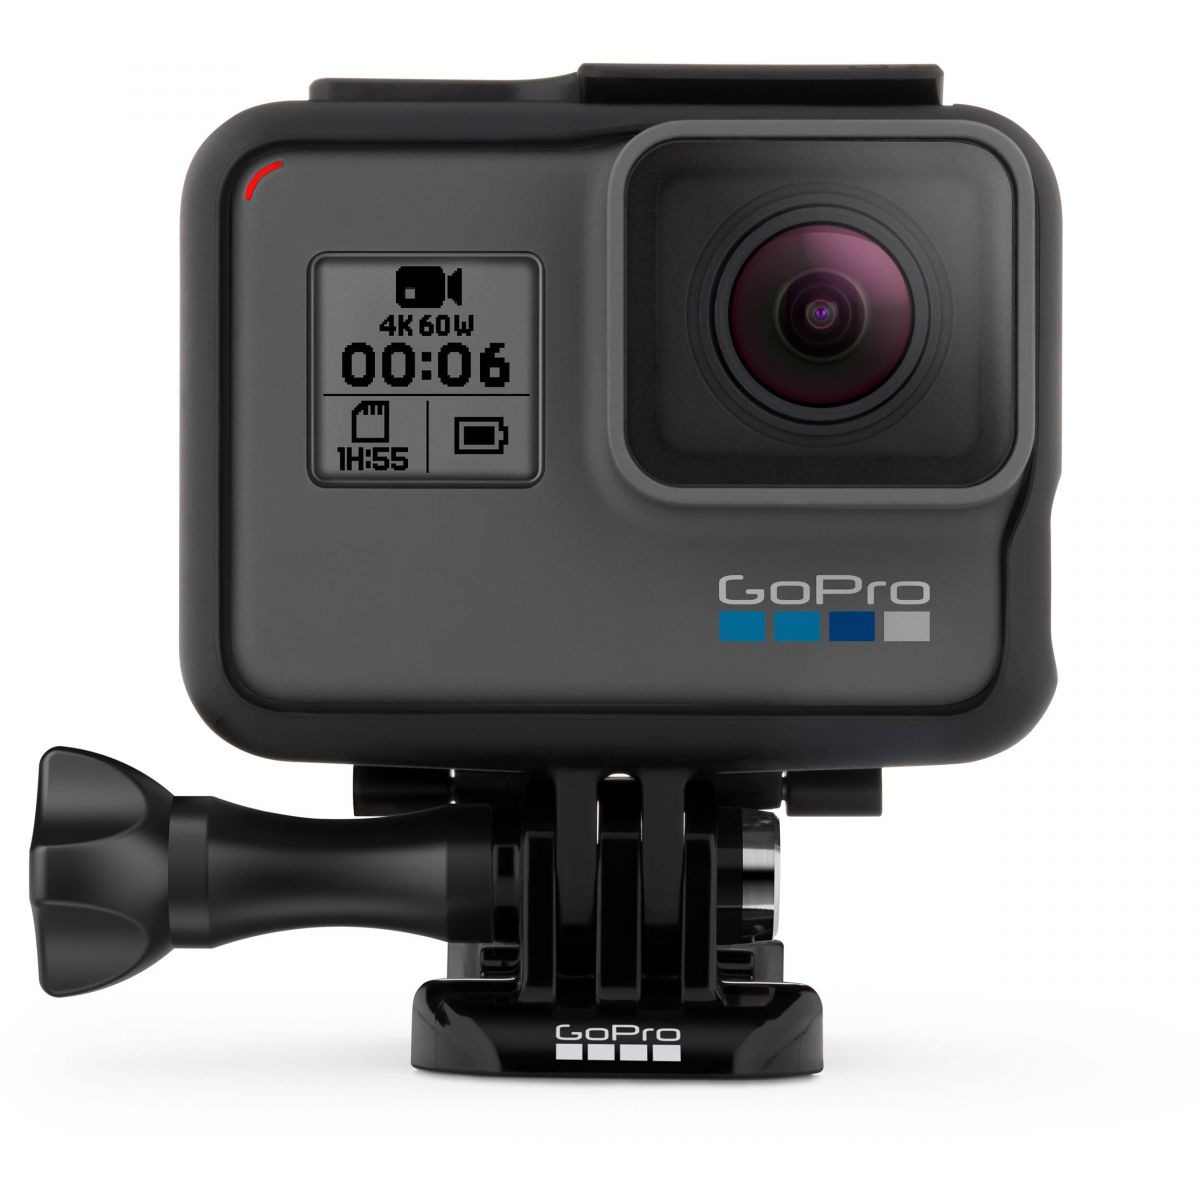 Máy quay GoPro Hero7 Black_CHDHX-701-RW